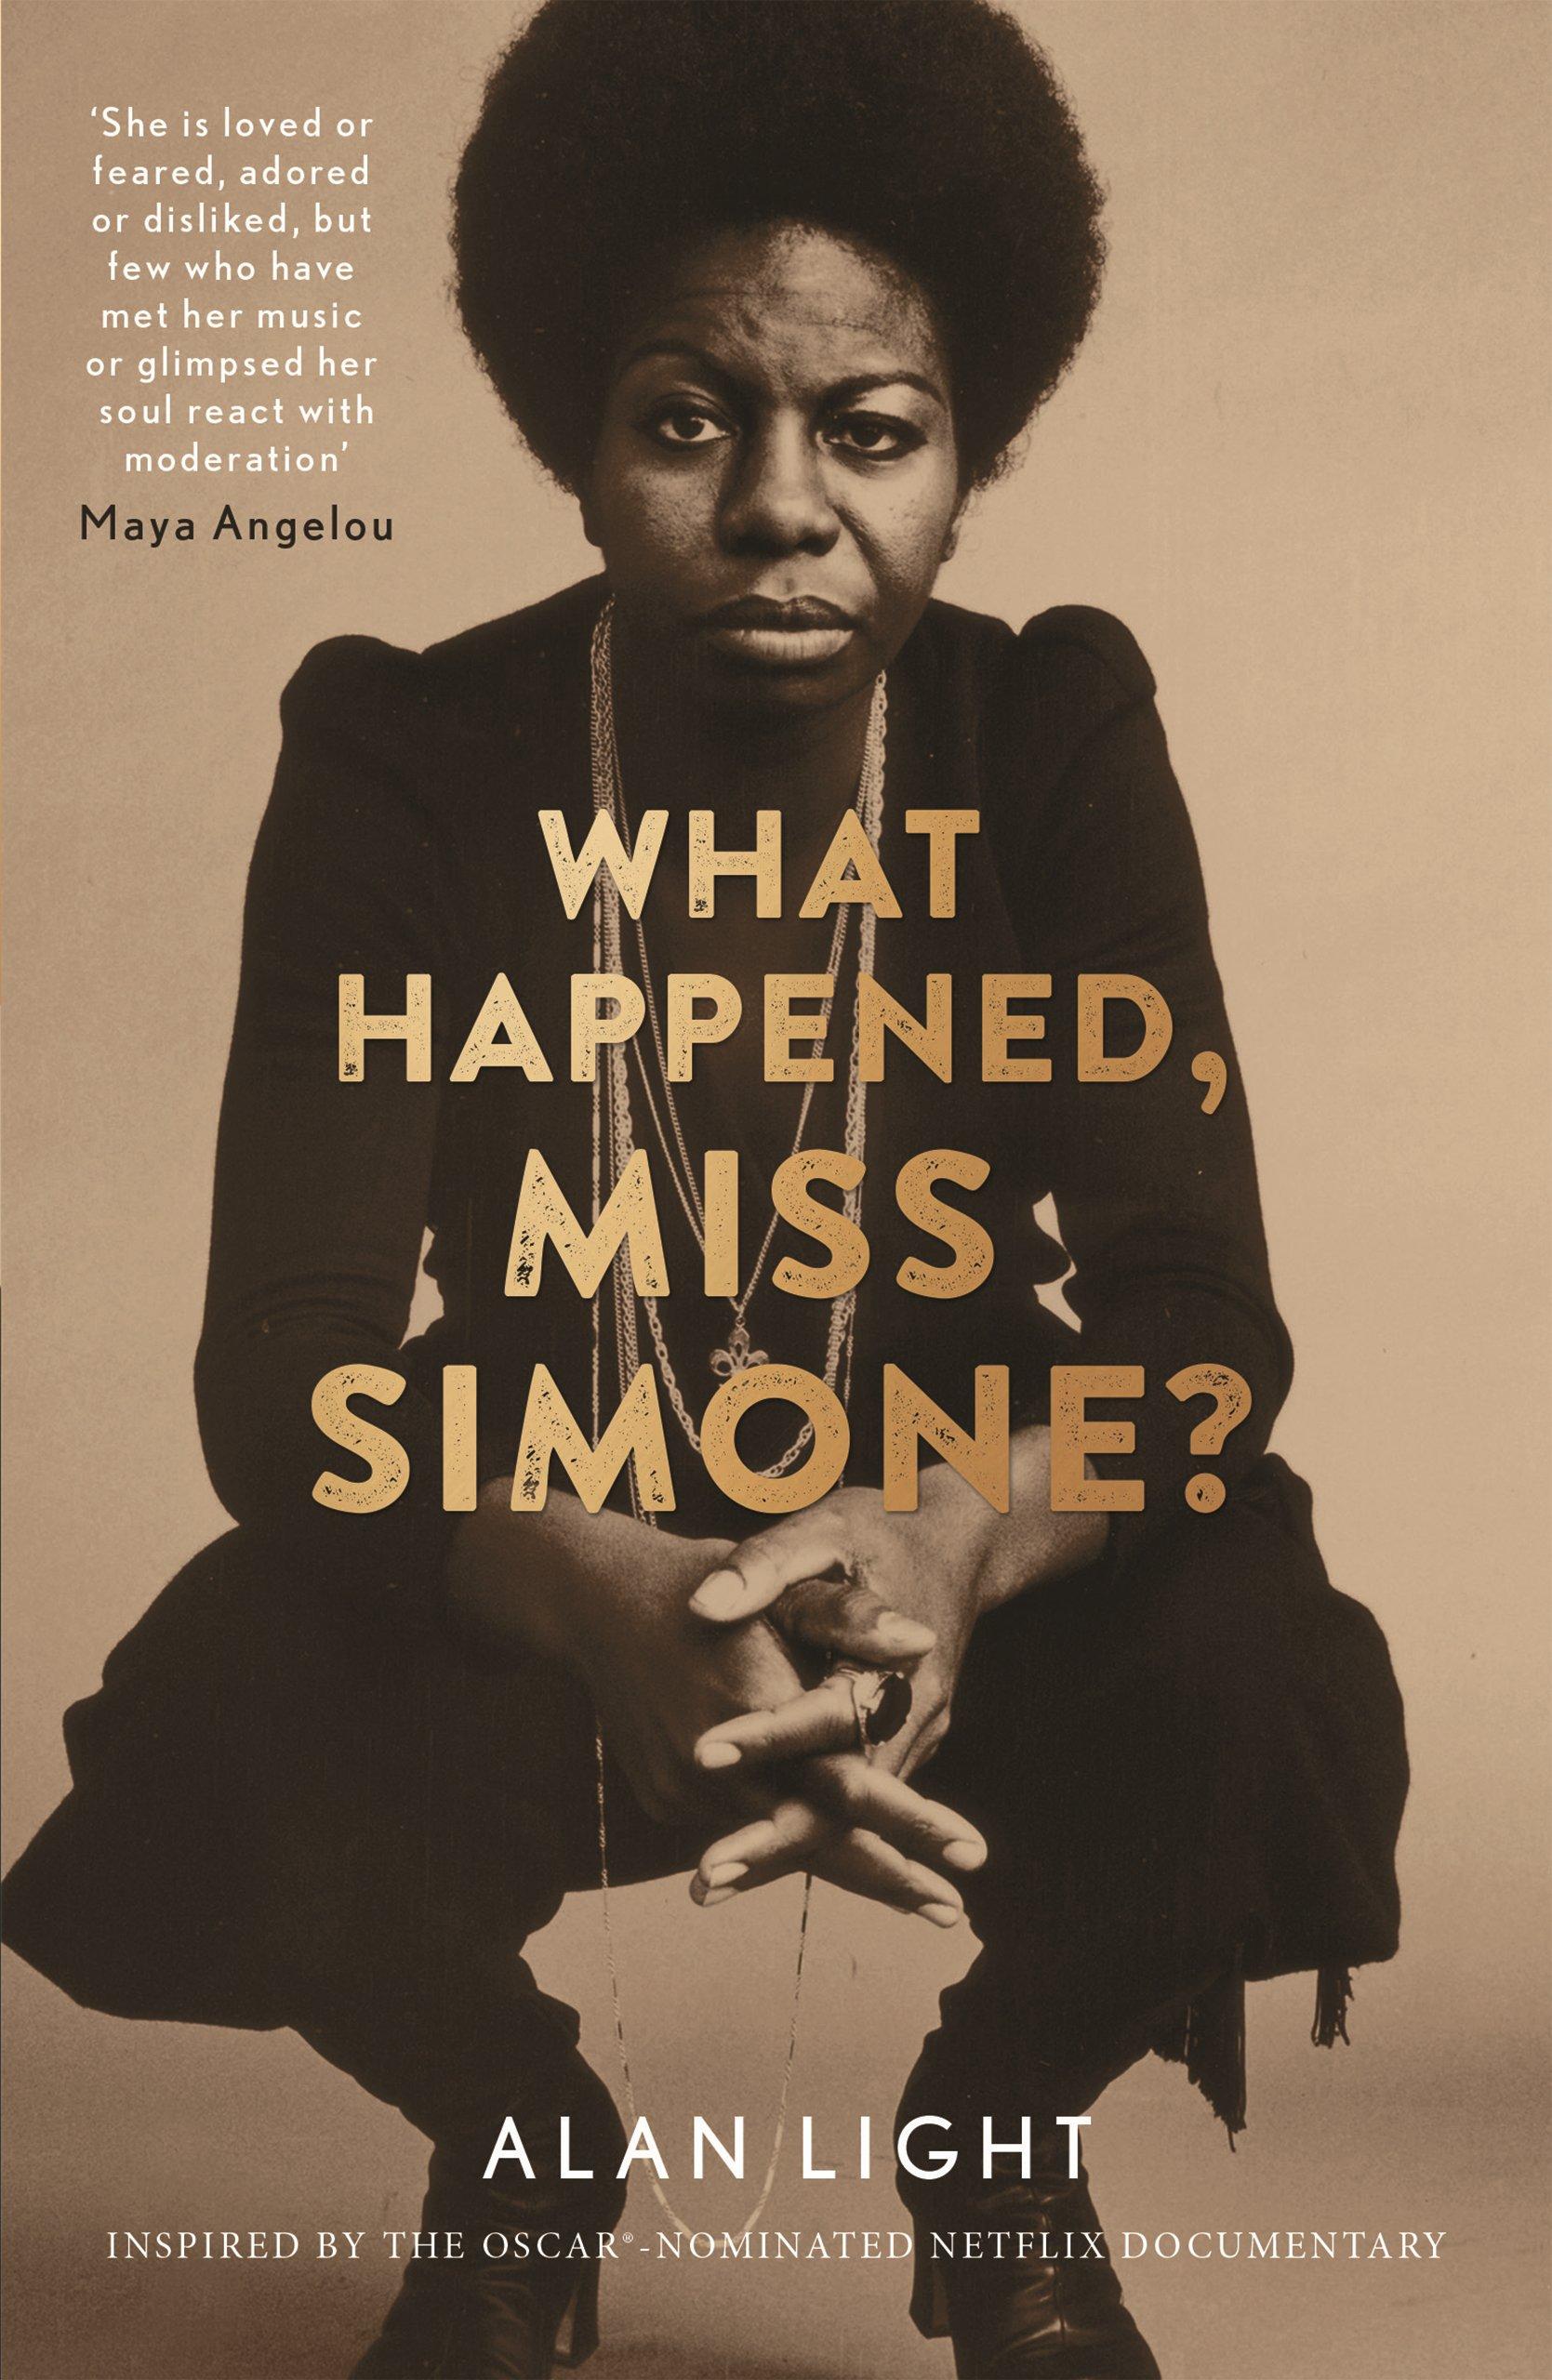 What Happened, Miss Simone? : A Biography (Anglais) Broché – 2 mars 2017 Alan Light Canongate Books Ltd 1782118748 Blues